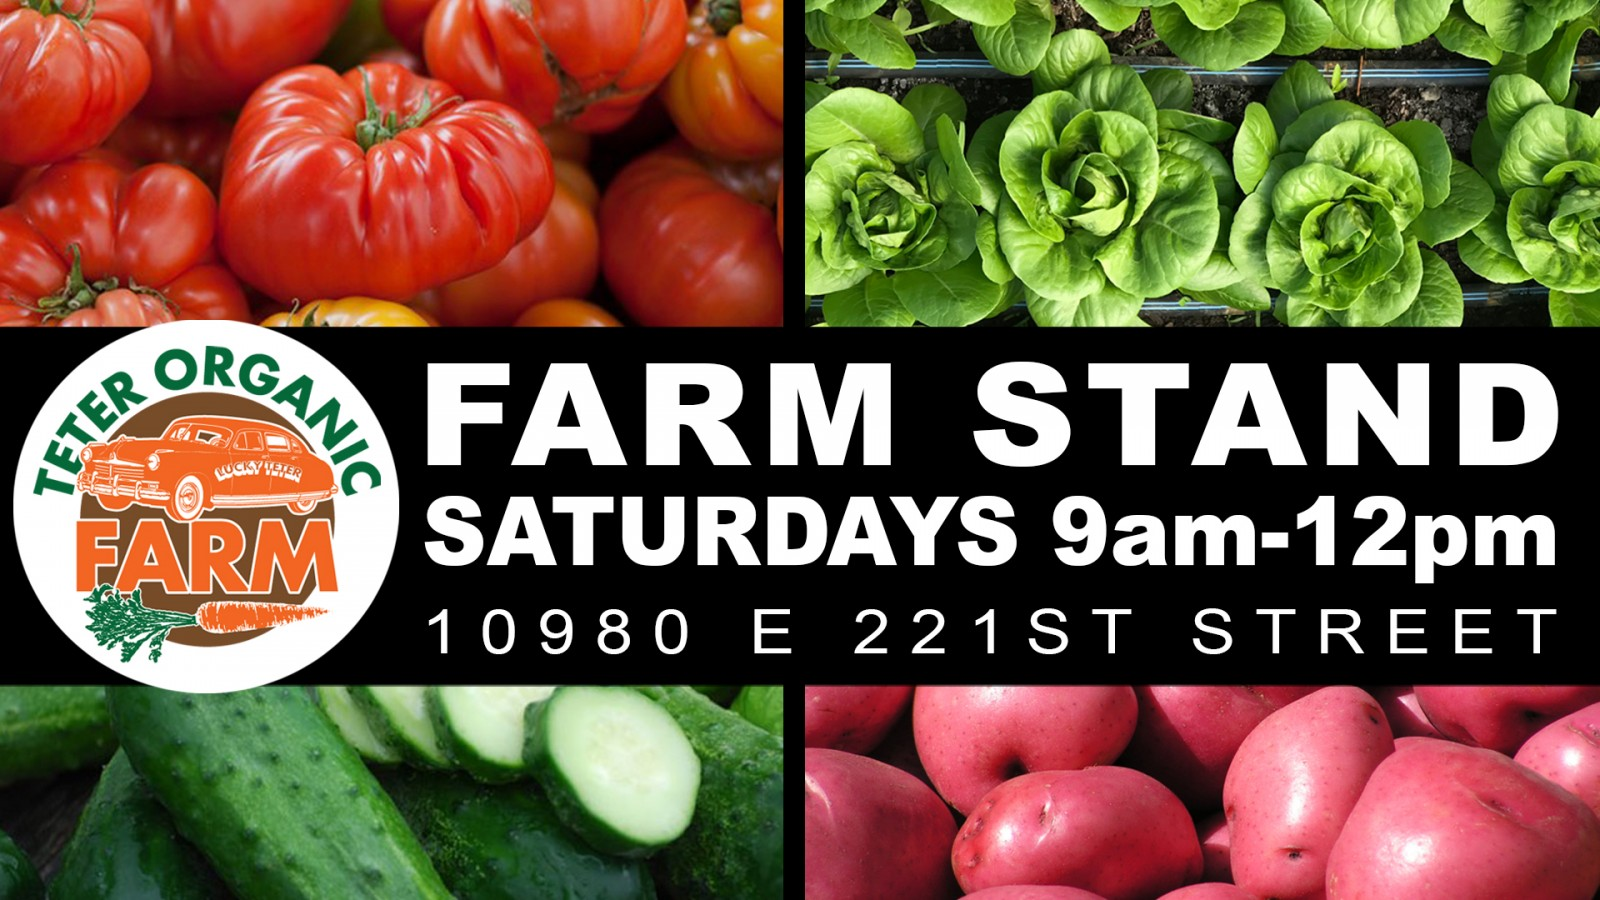 Farm Stand | 2020 slide - address